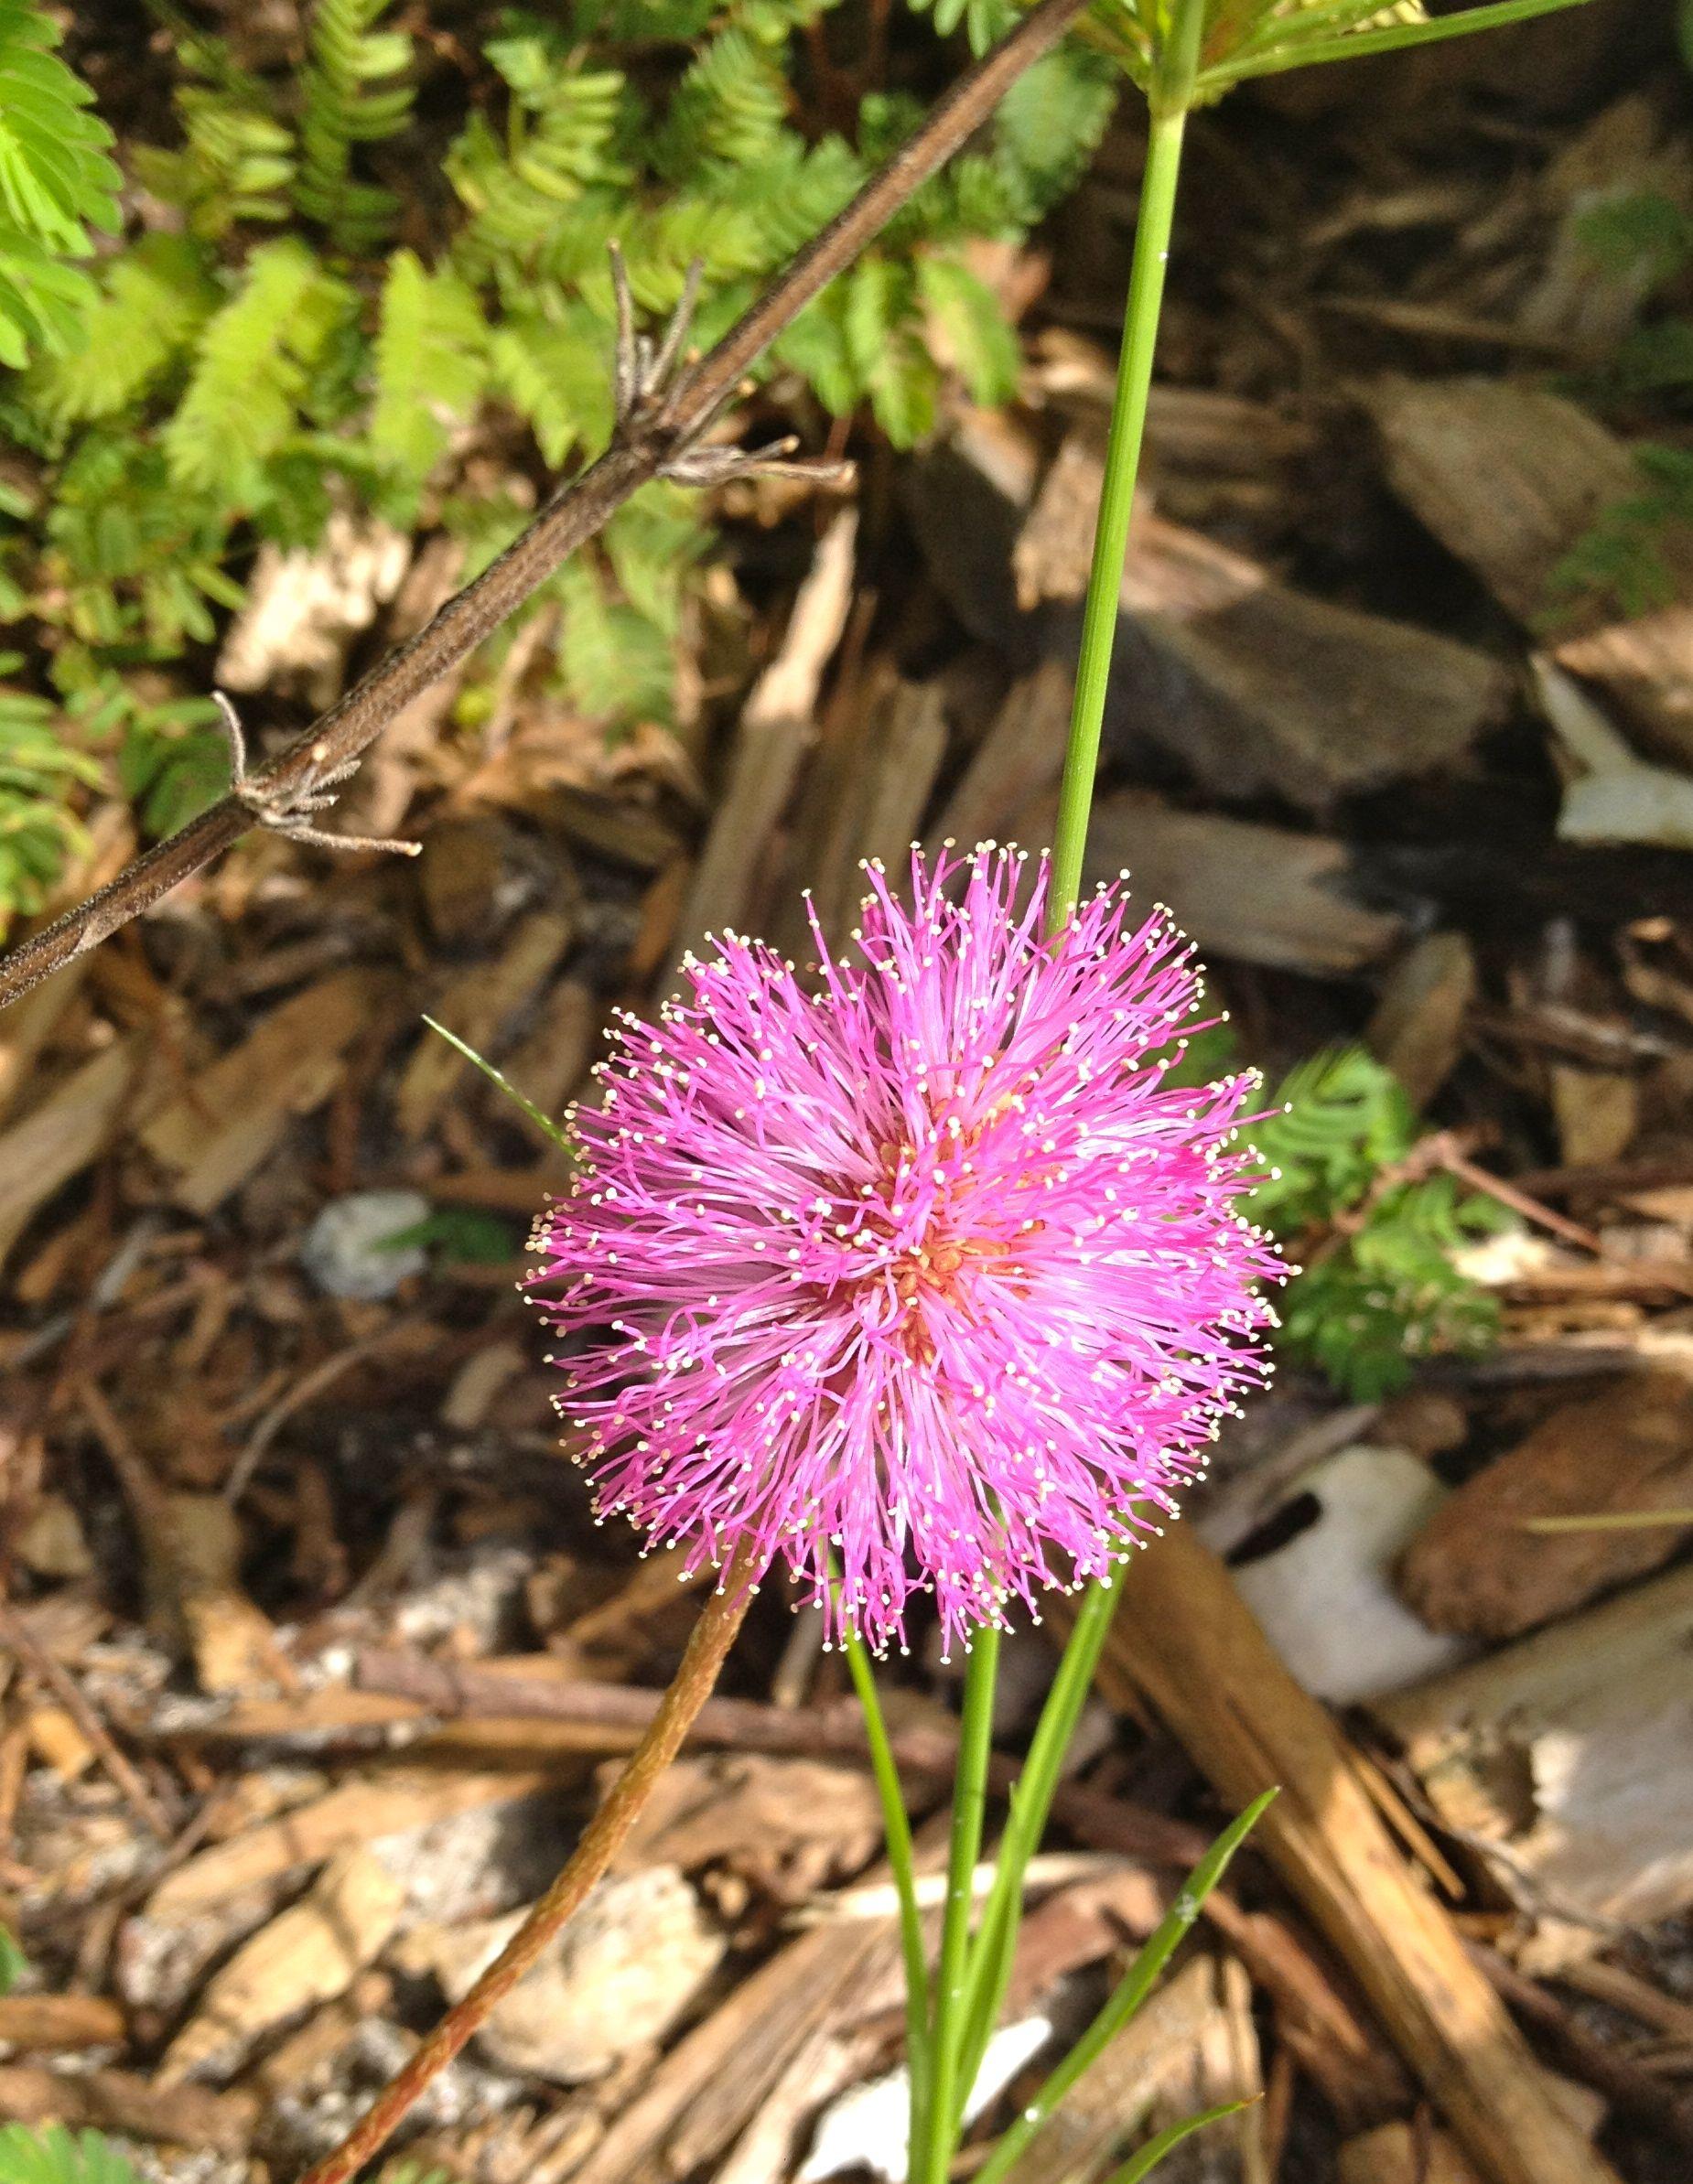 This One Looks Like A Pink Dandelion Dandelion Flowers Plants